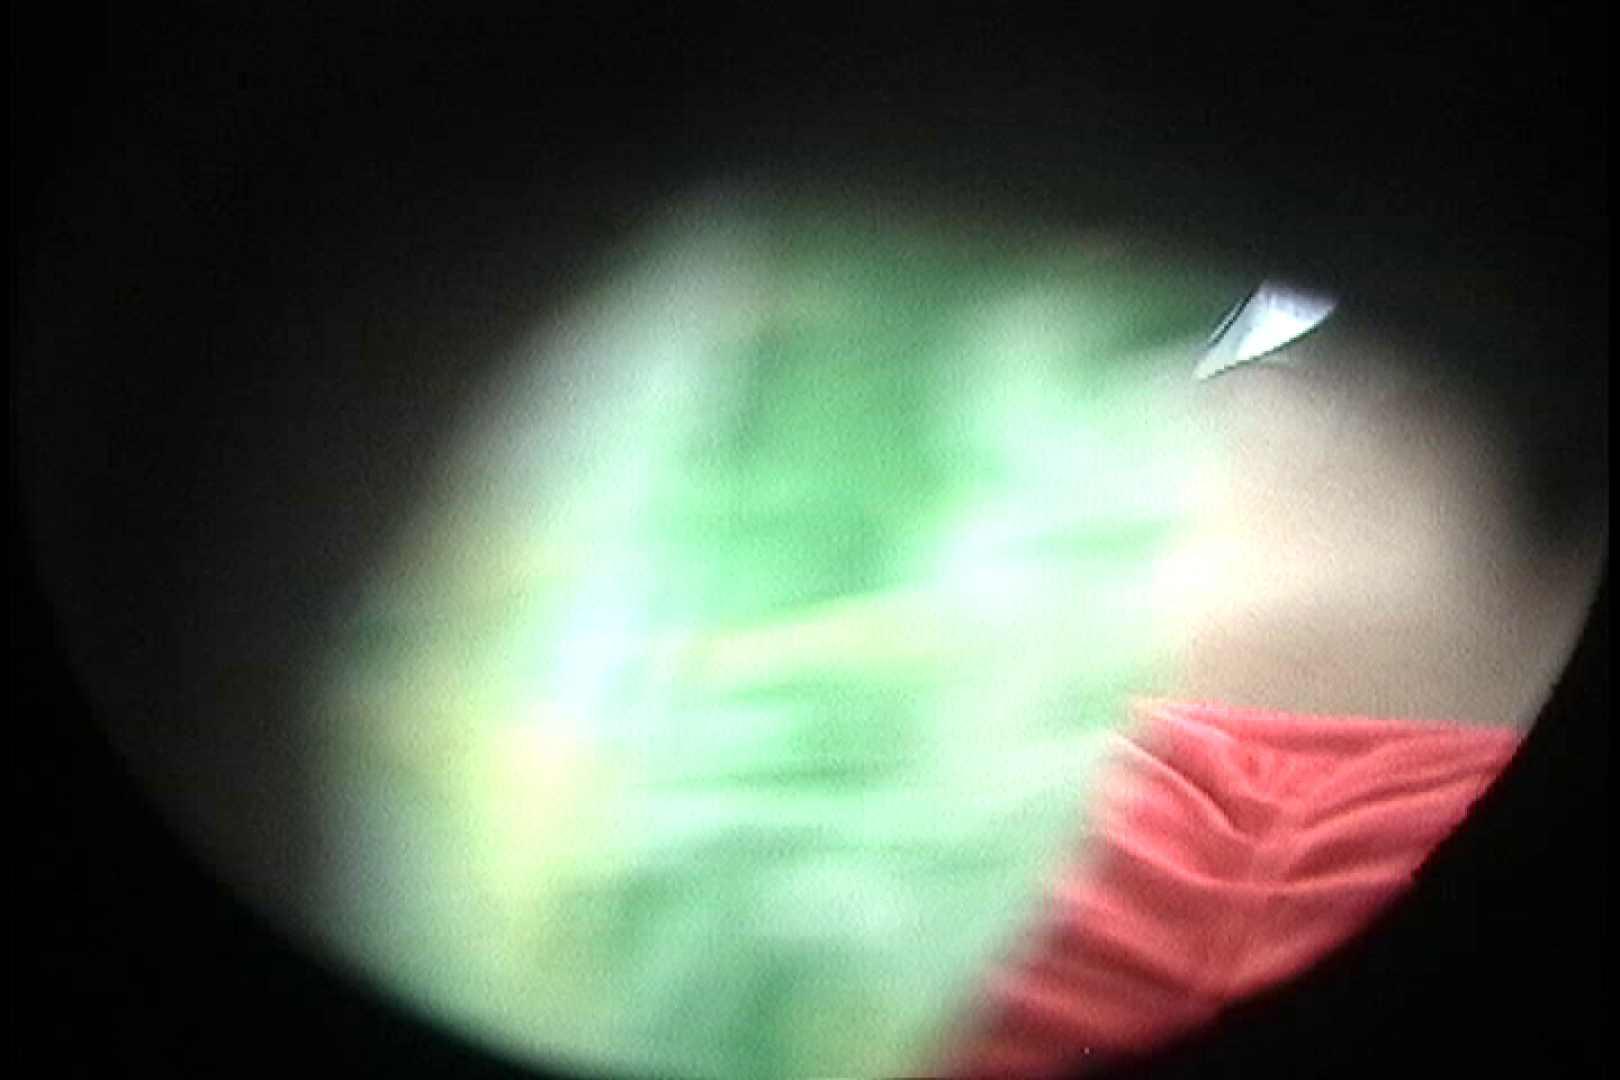 No.22 日焼け跡とオッパイの関係がおかしな貧乳ギャル 日焼け | ギャルエロ画像  89PICs 9